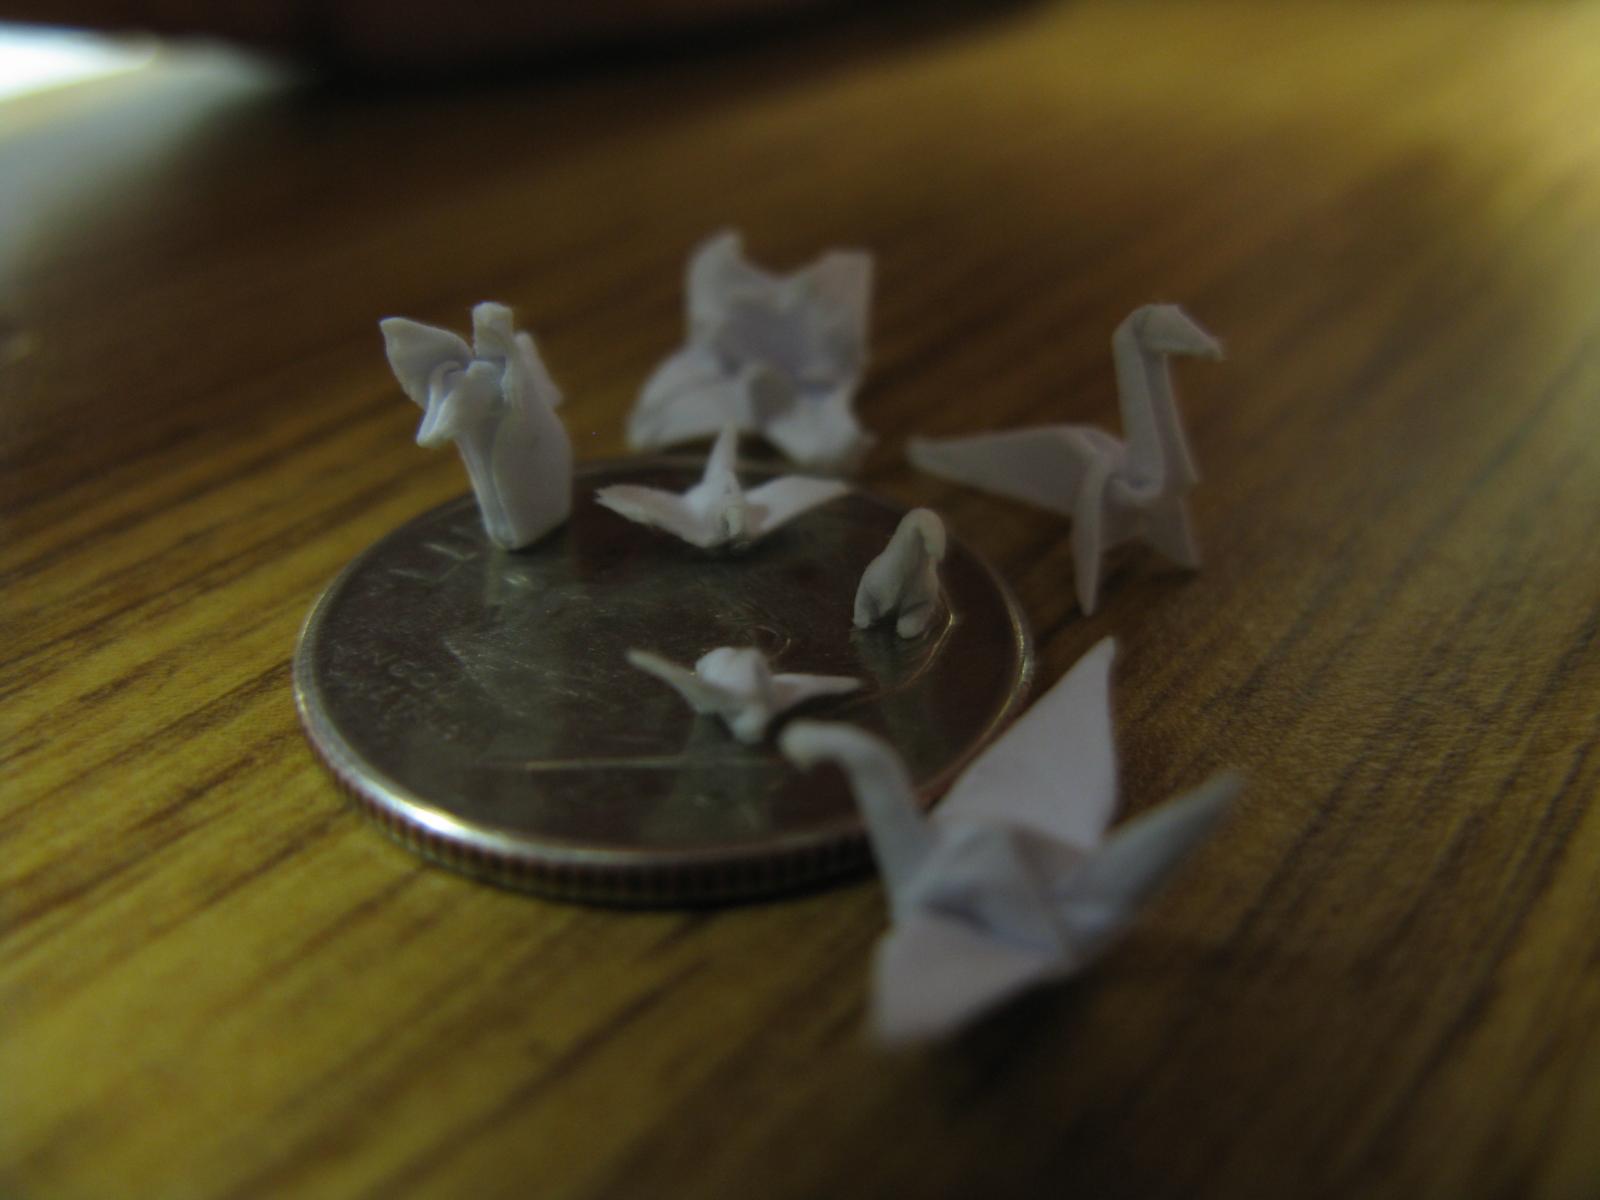 Making Very Tiny Origami